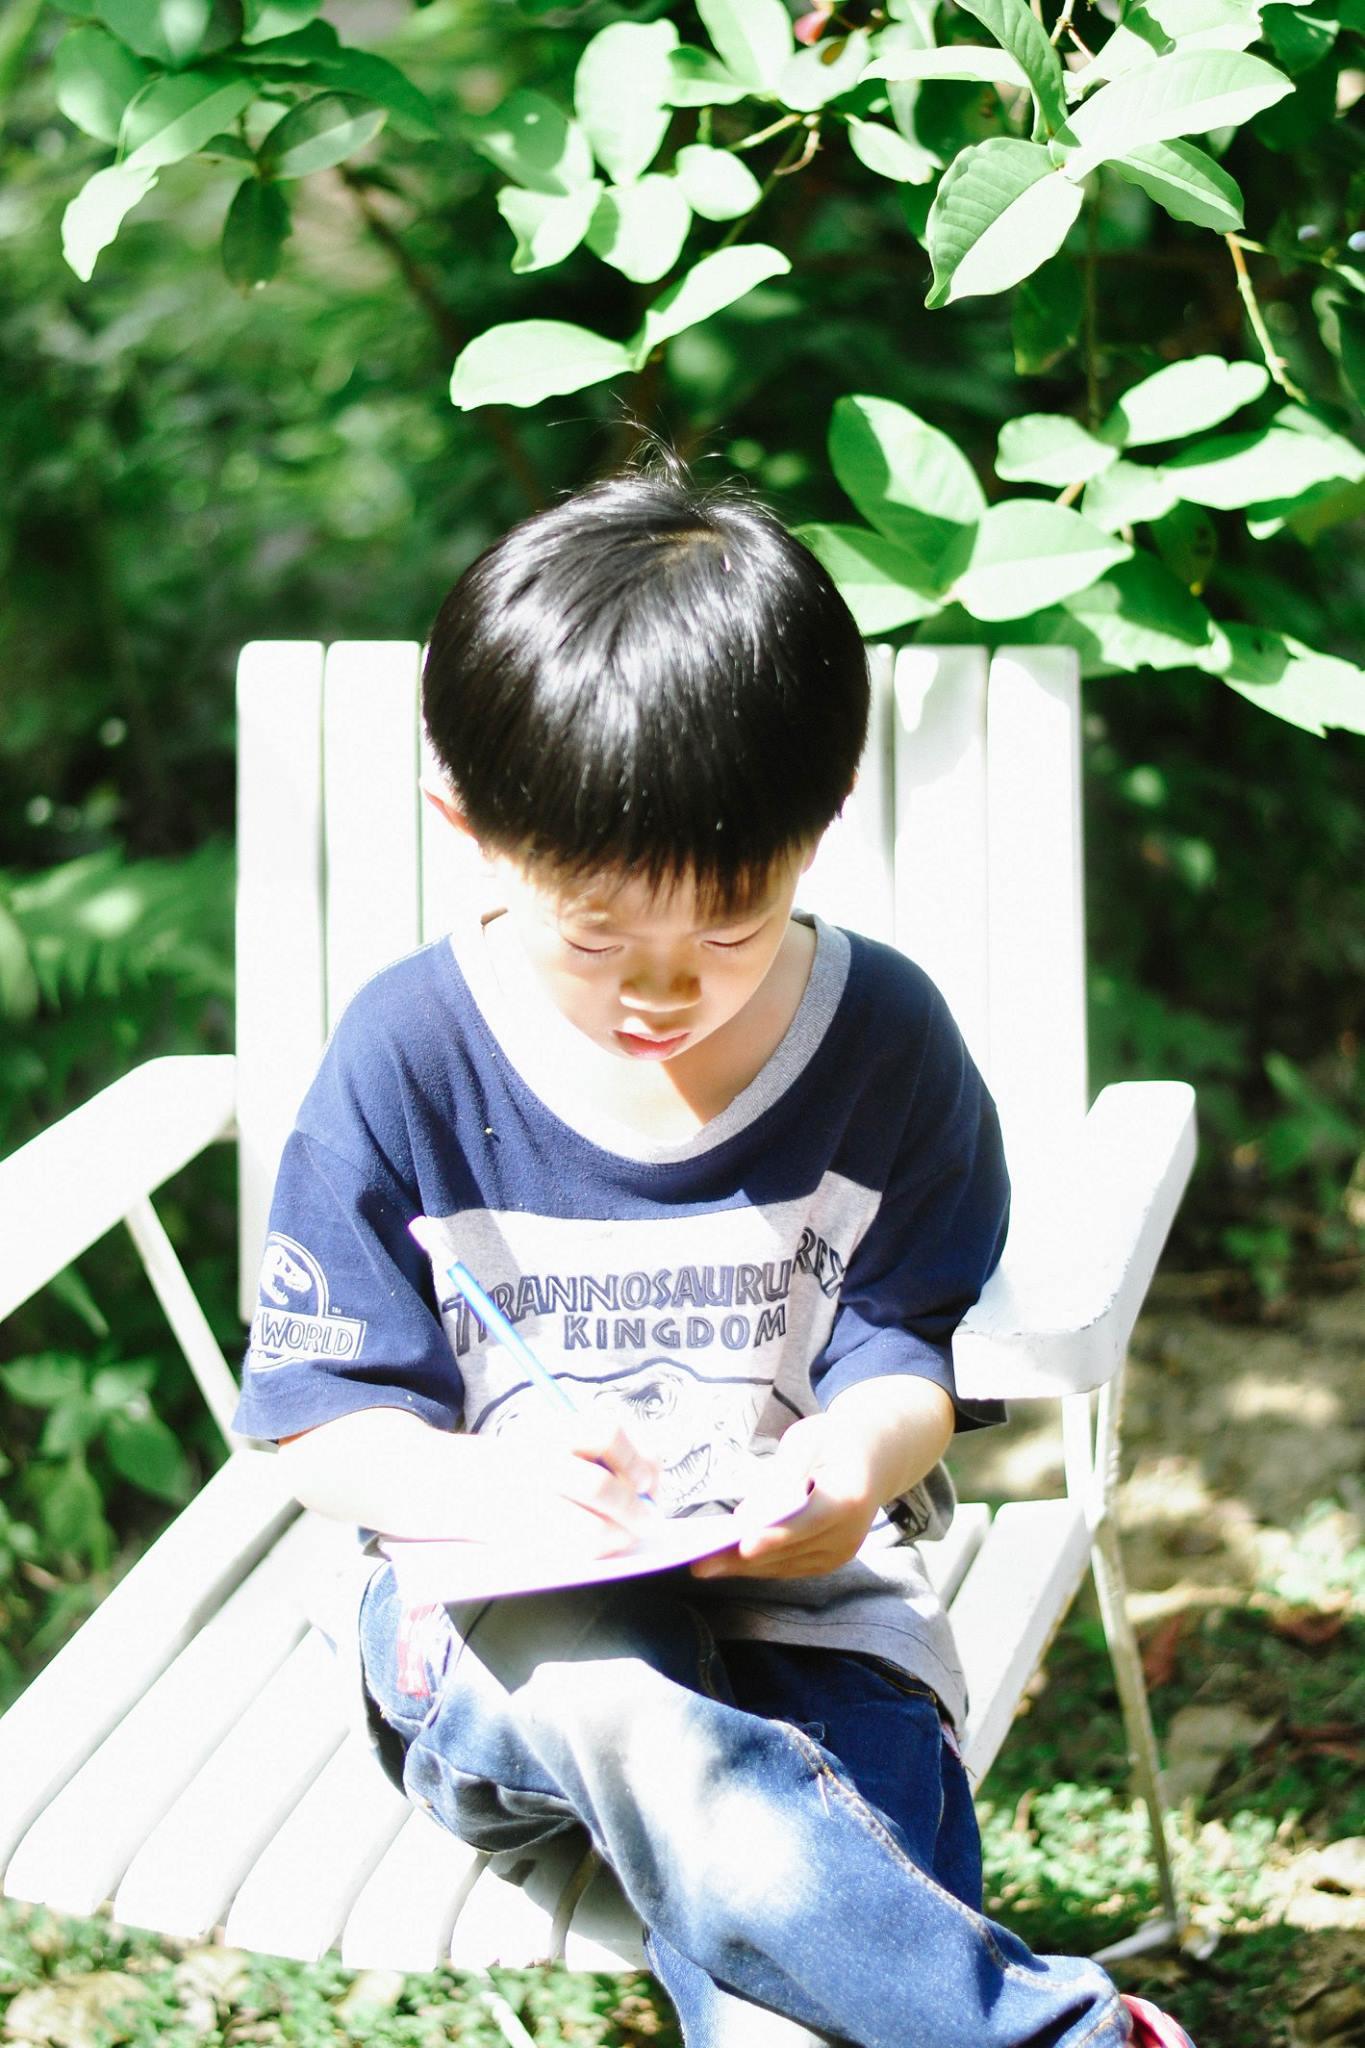 Pann&his study